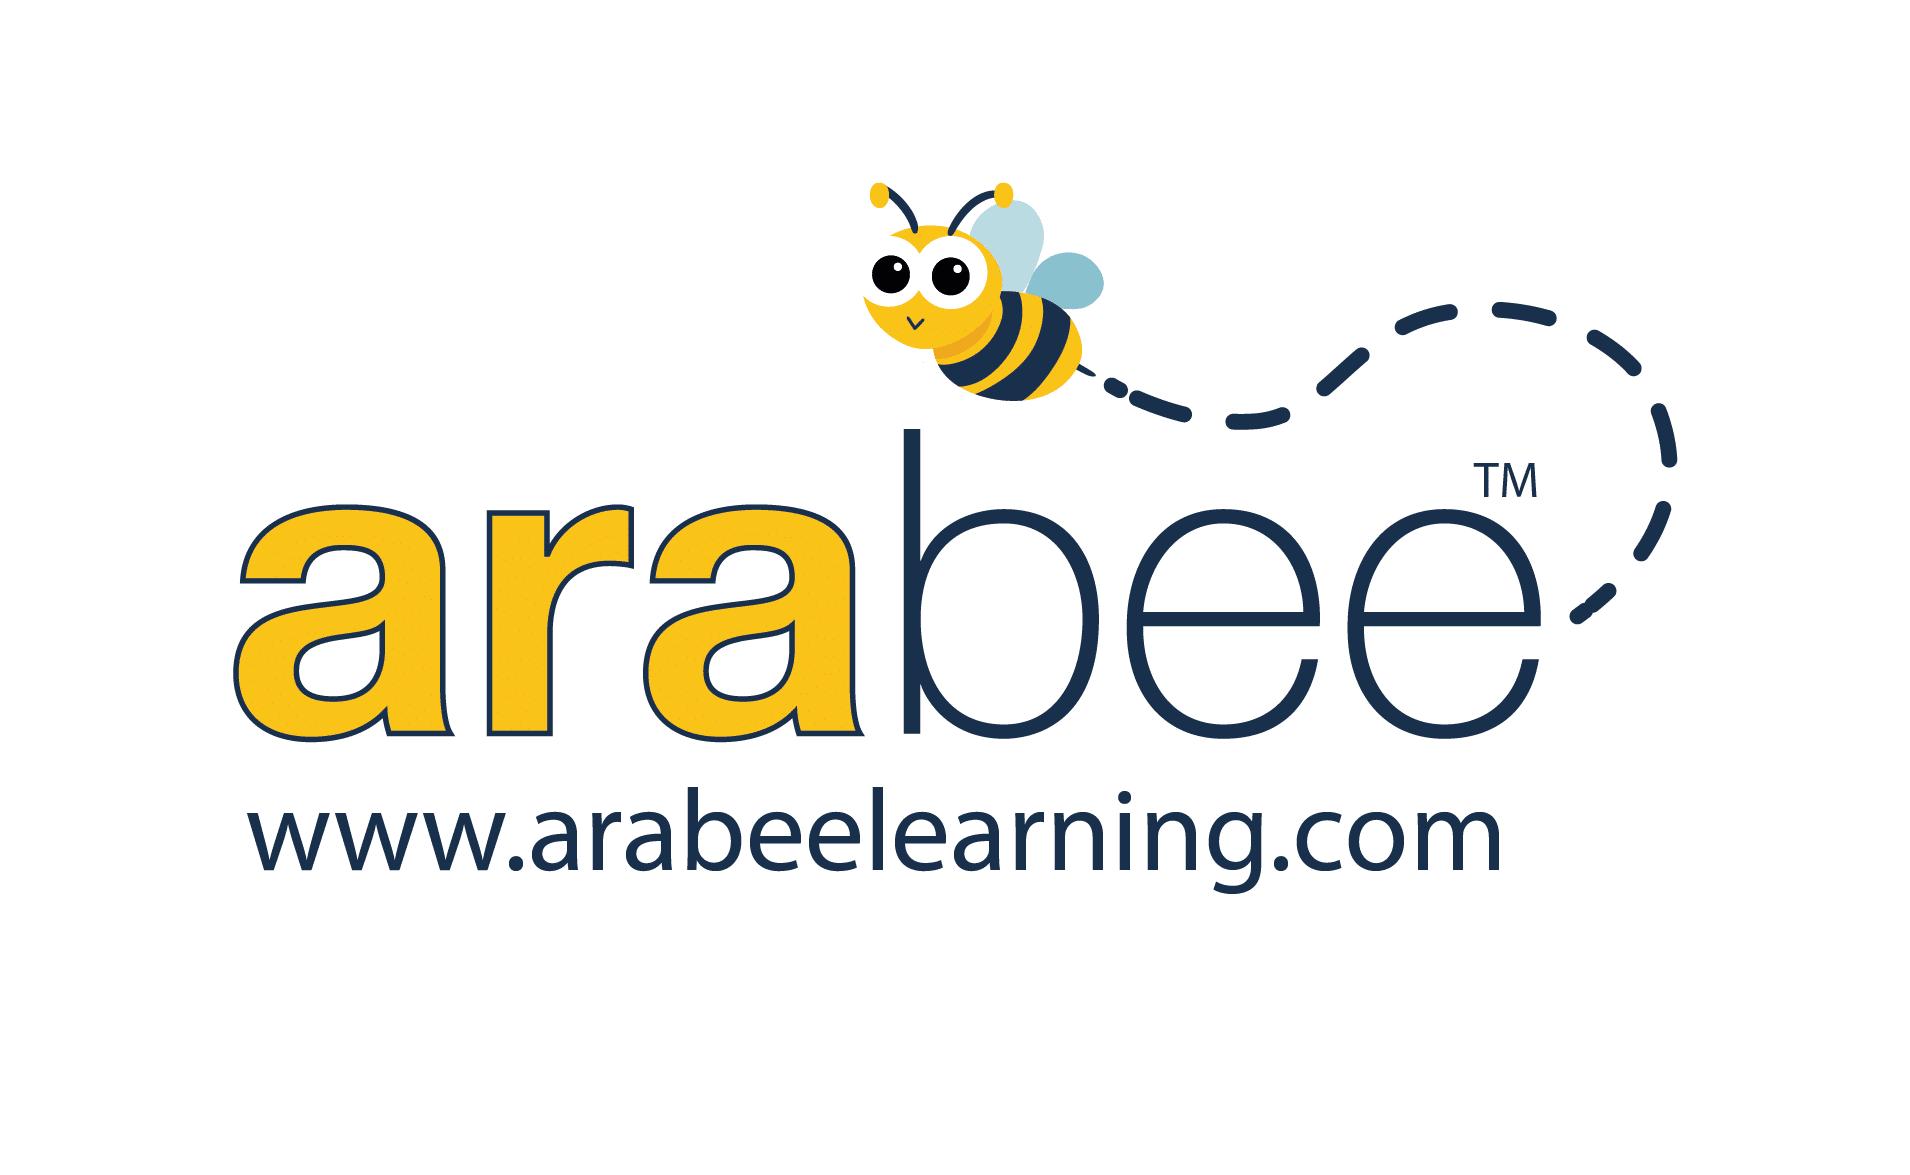 Arabee logo